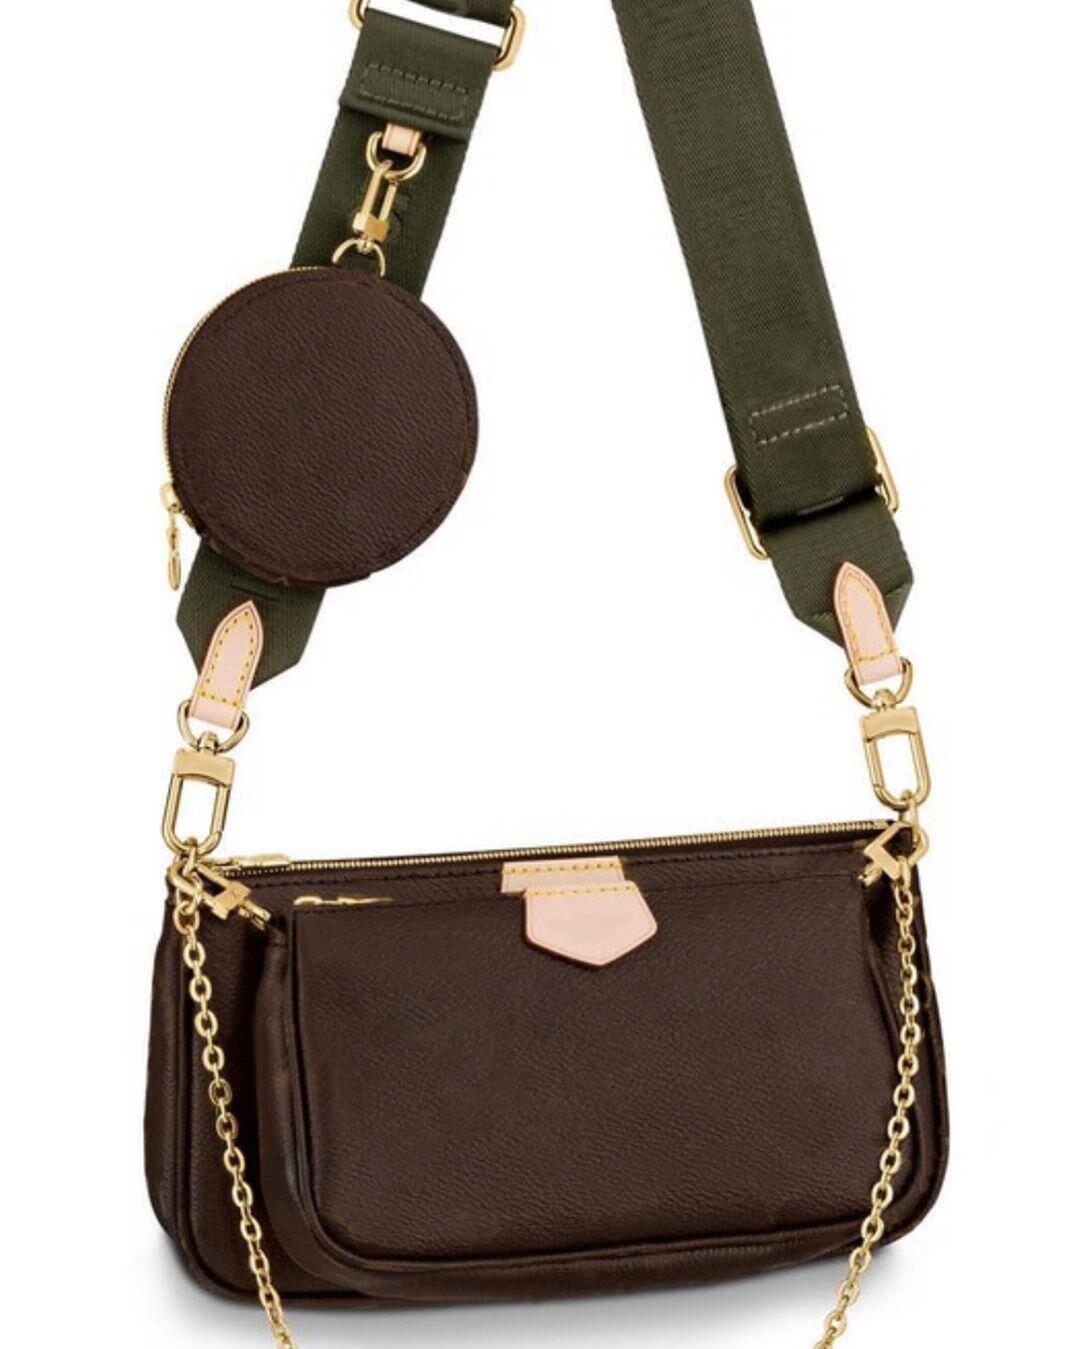 2020 bolsos de mano bolsas de asas de las mujeres bolsas de diseñador Multi Pochette Accessoires Moda Hombres Pequeño Bolsa de hombro Bolsa de hombro Cadena Bolsa de Crossbody Famosa